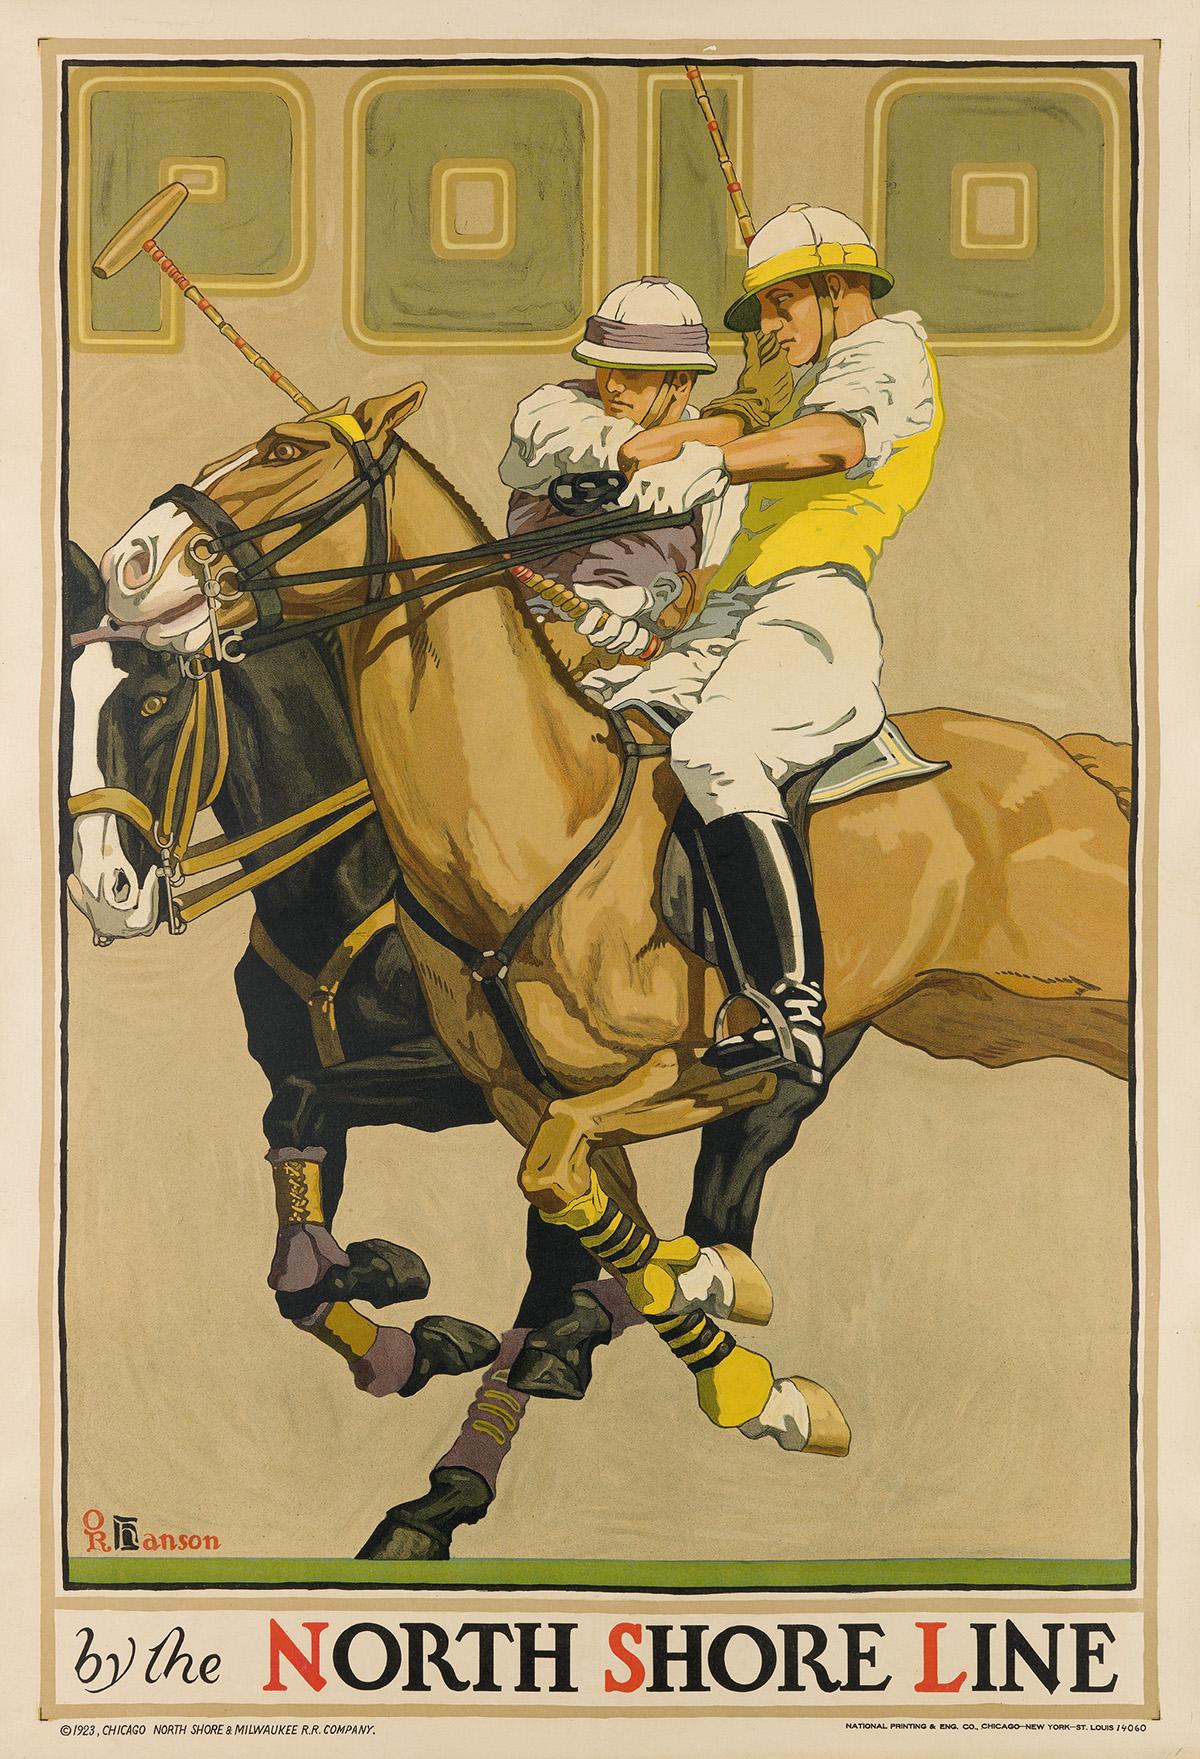 OSCAR-RABE-HANSON-(1901-1926)-POLO--BY-THE-NORTH-SHORE-LINE-